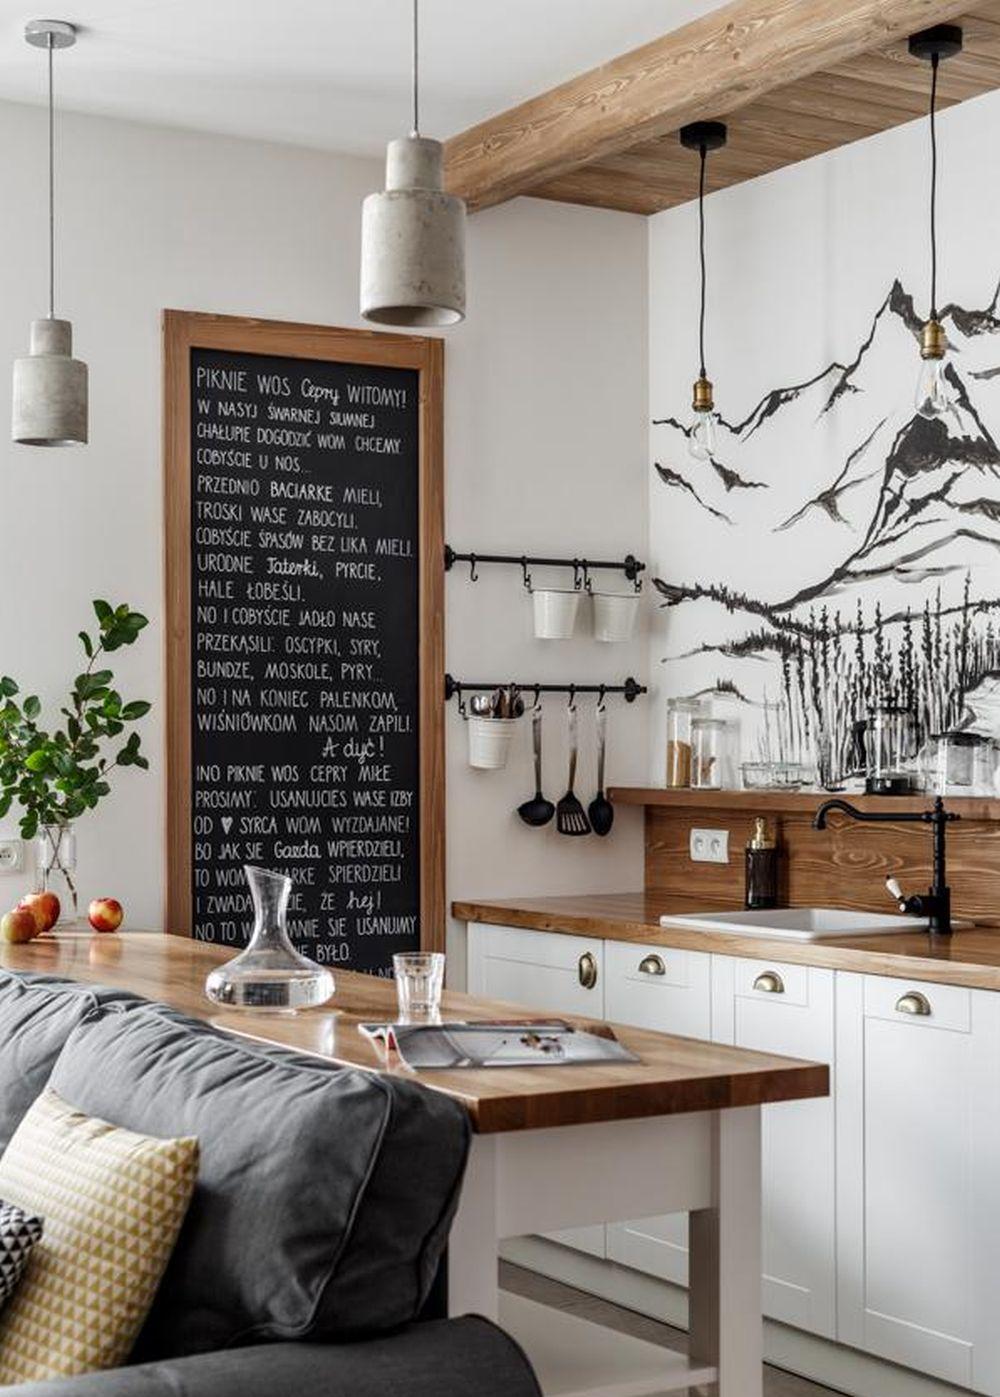 adelaparvu.com despre apartament 2 camere, 46 mp, in stil montan, Polonia, Foto TatryTop (1)